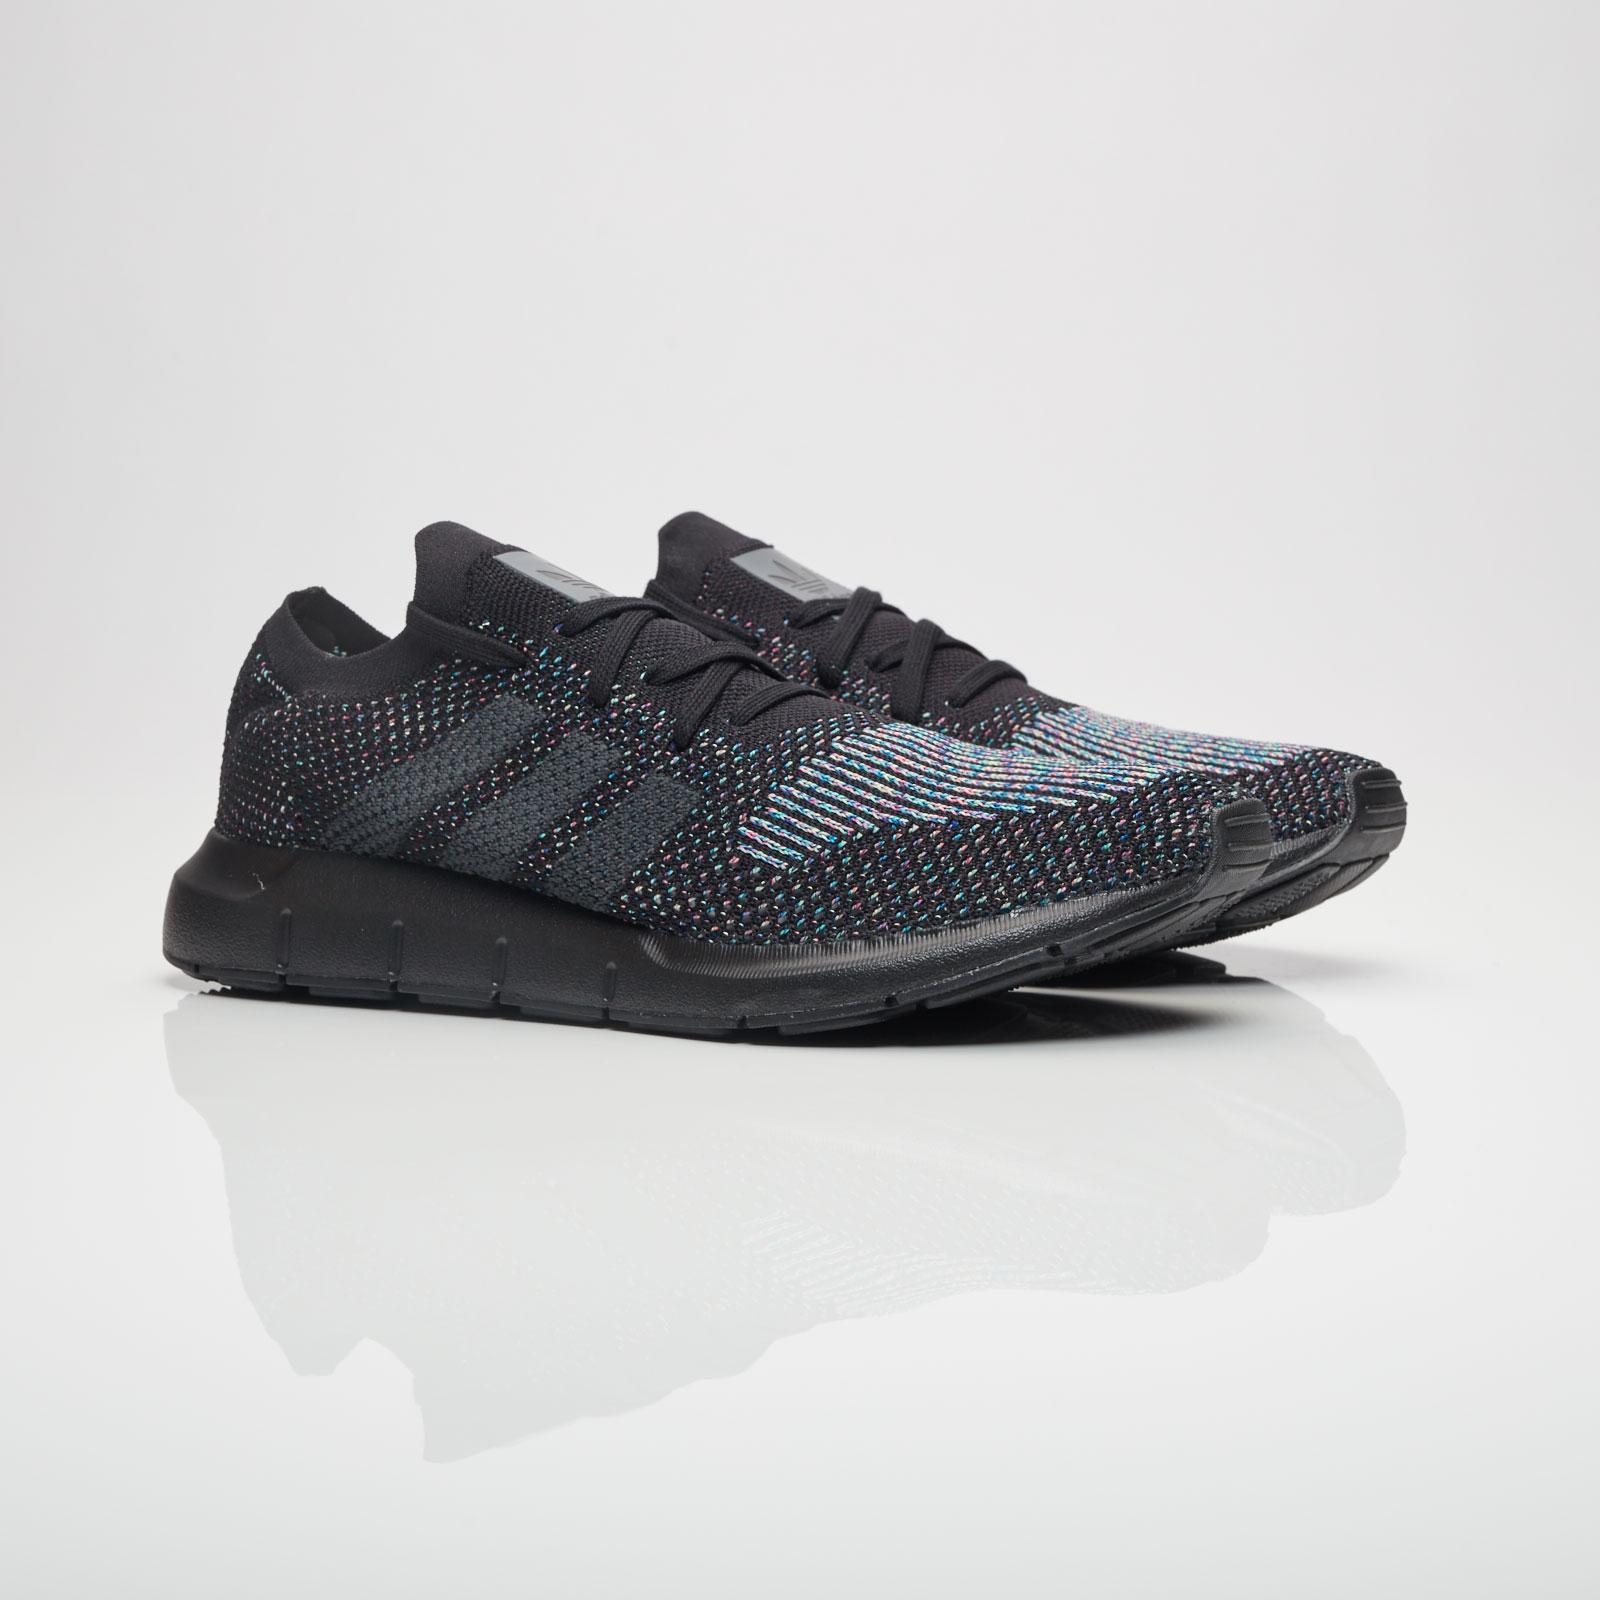 6566207deb5c adidas Swift Run PK - Cg4127 - Sneakersnstuff